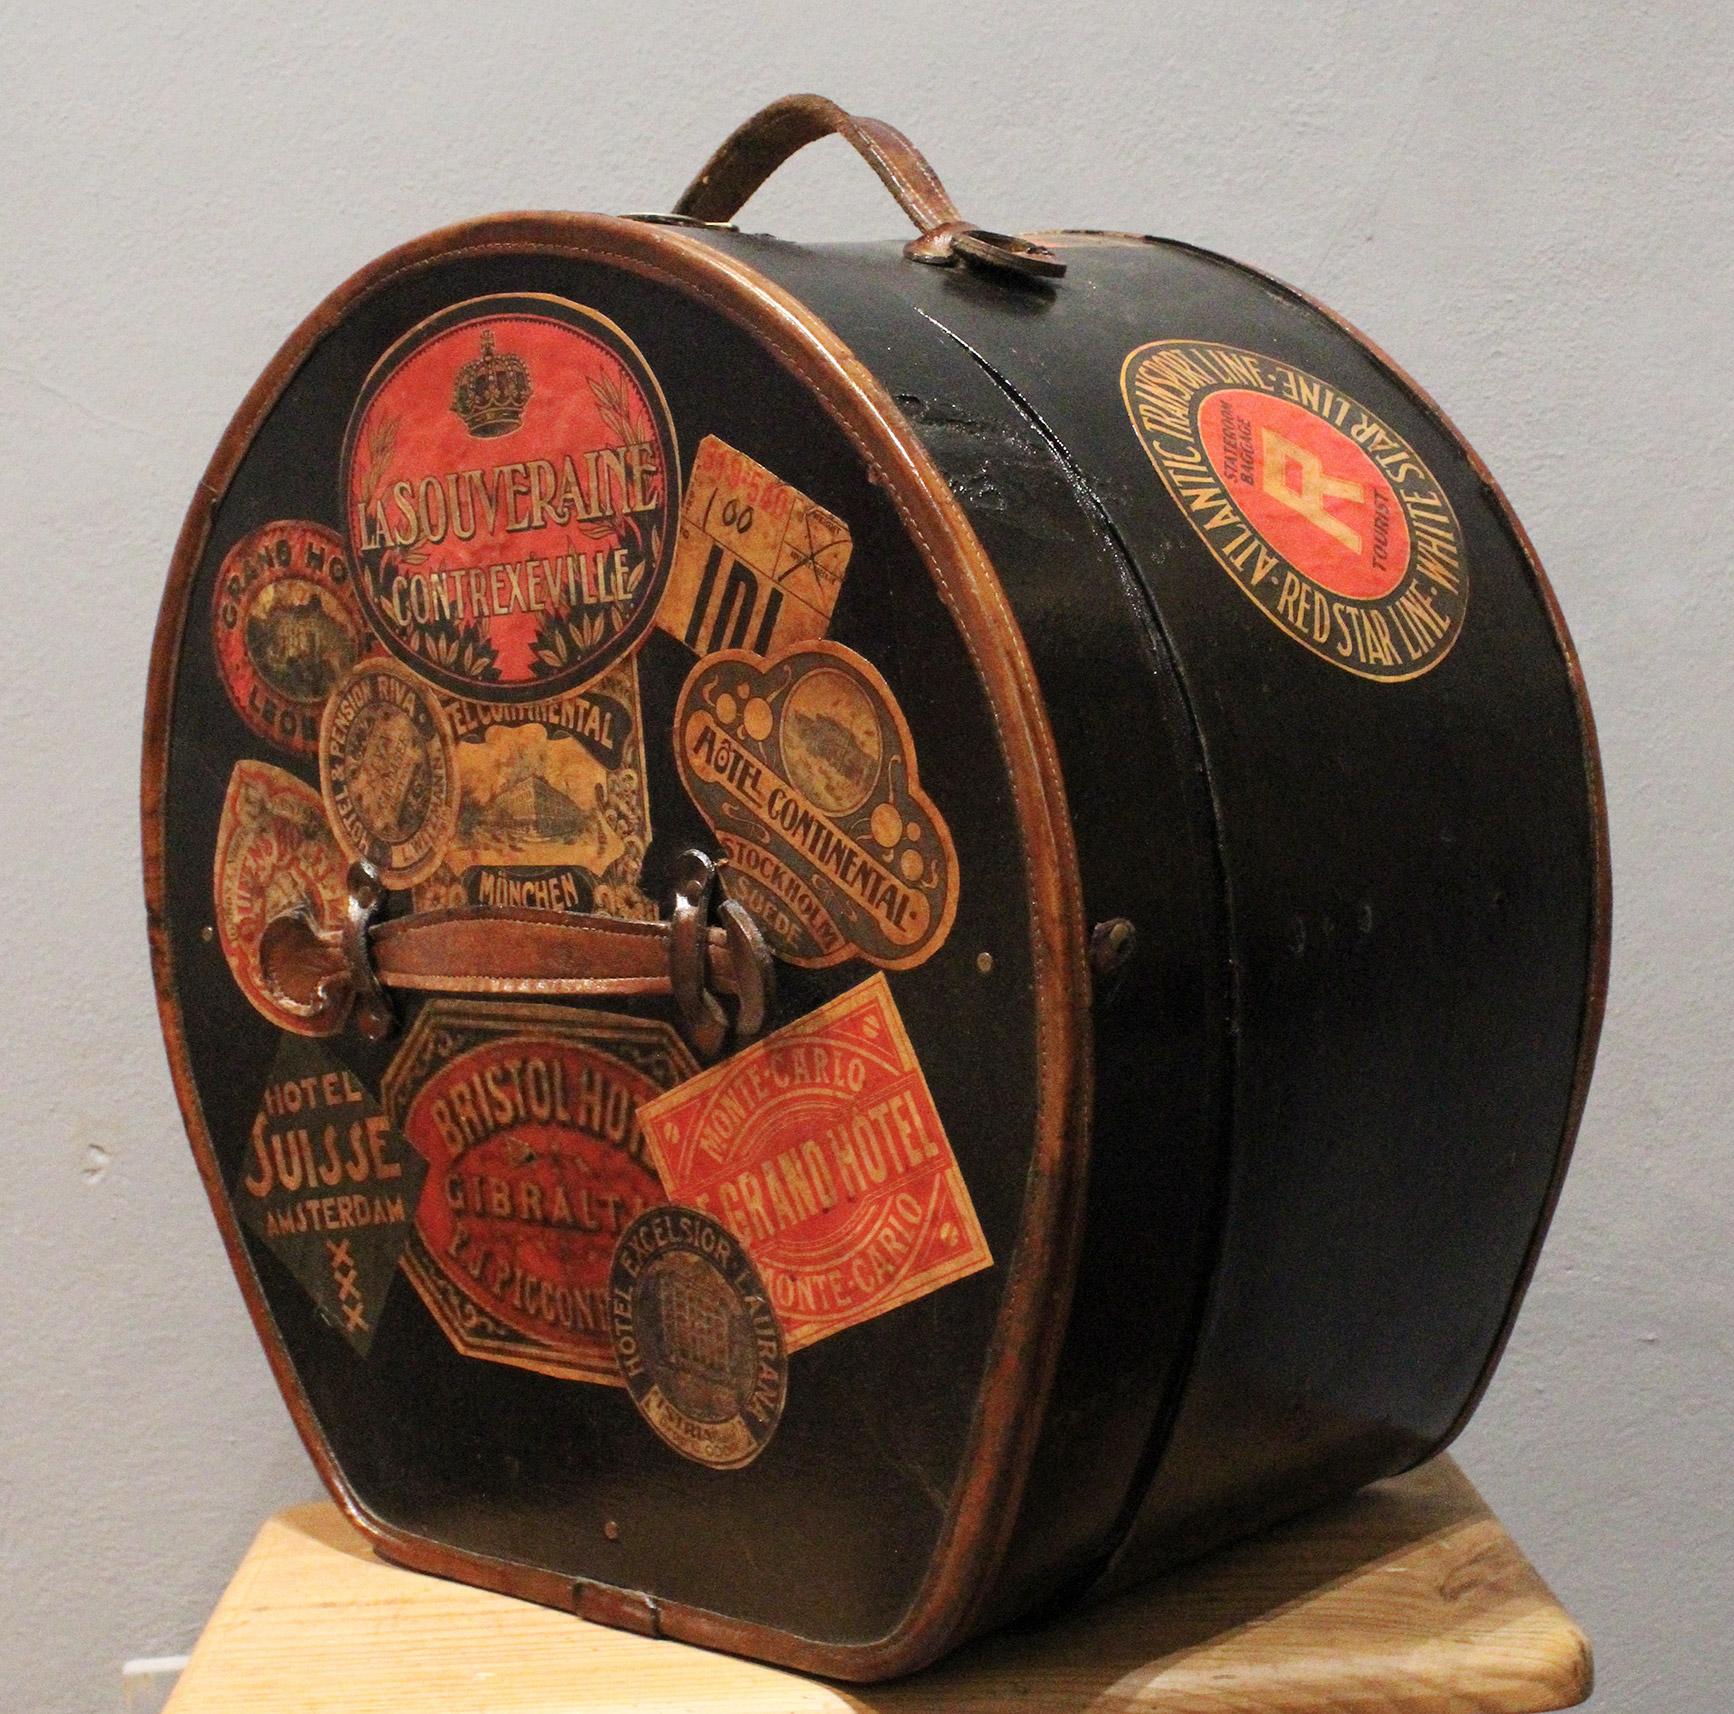 cappelliera-inglese-vintage